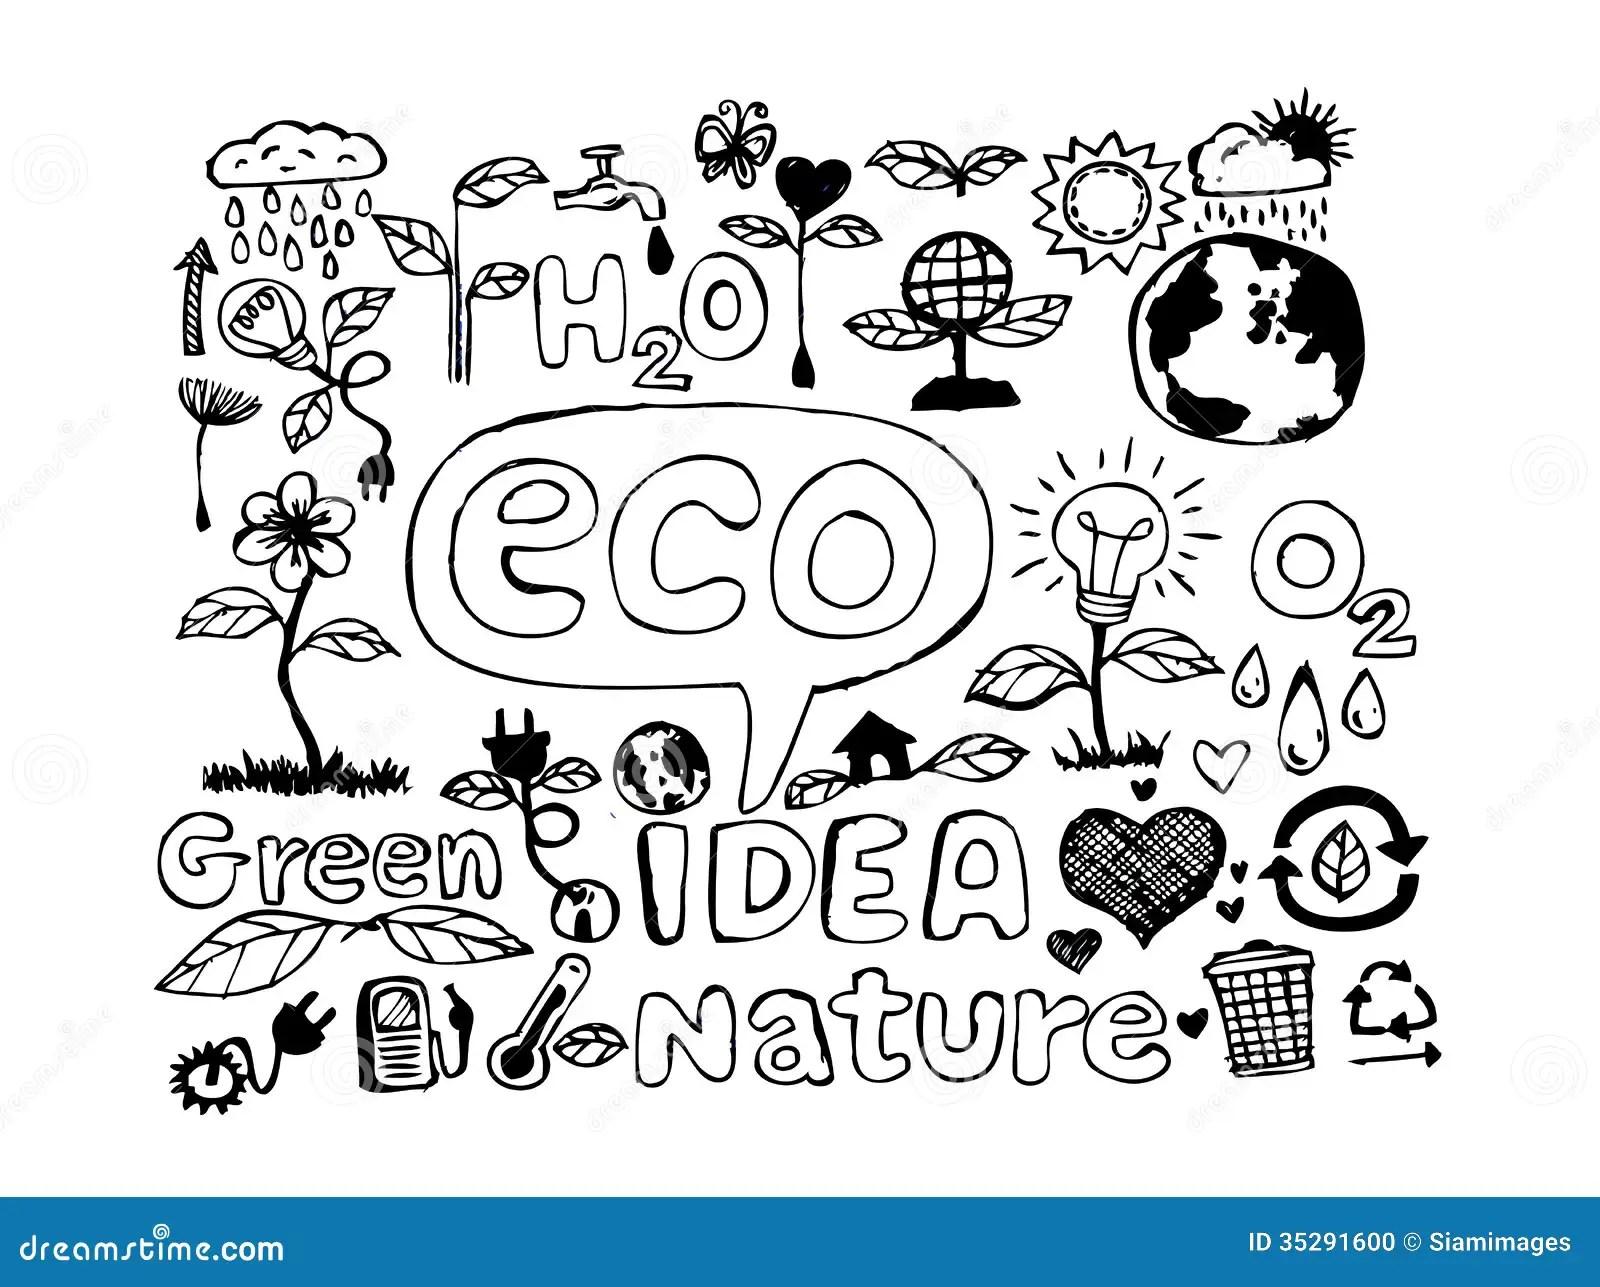 Eco Idea Sketch And Eco Friendly Doodles Stock Photo